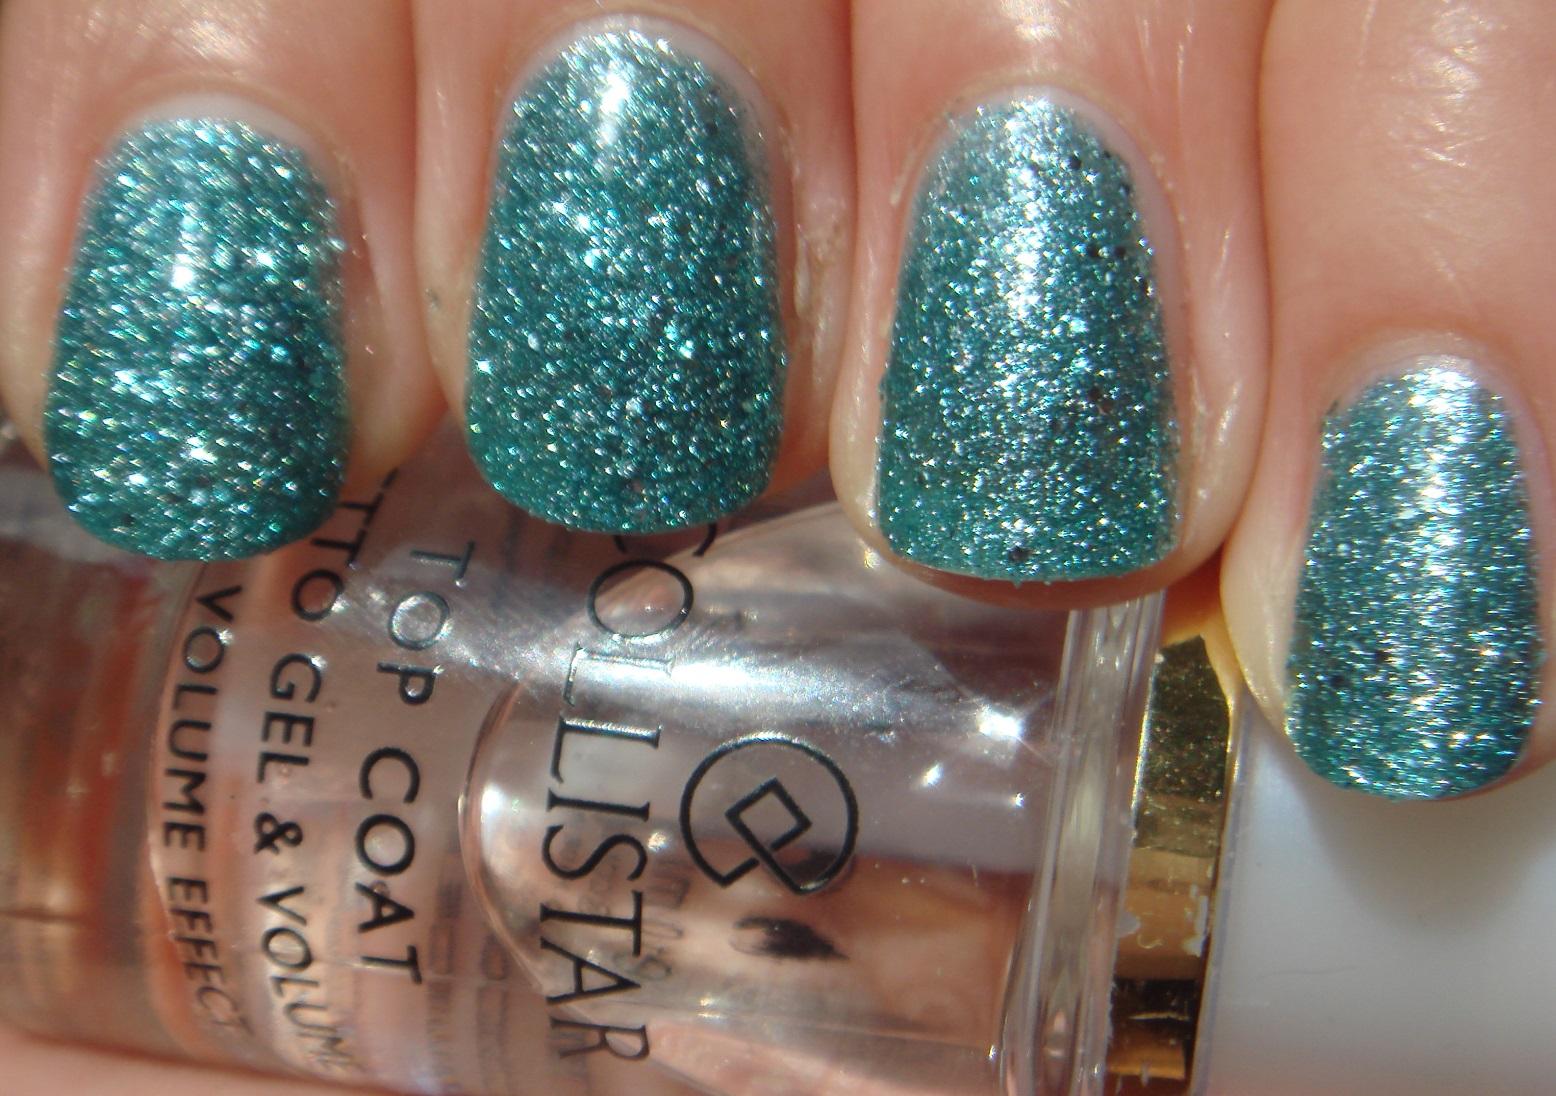 collistar gel nagellak review